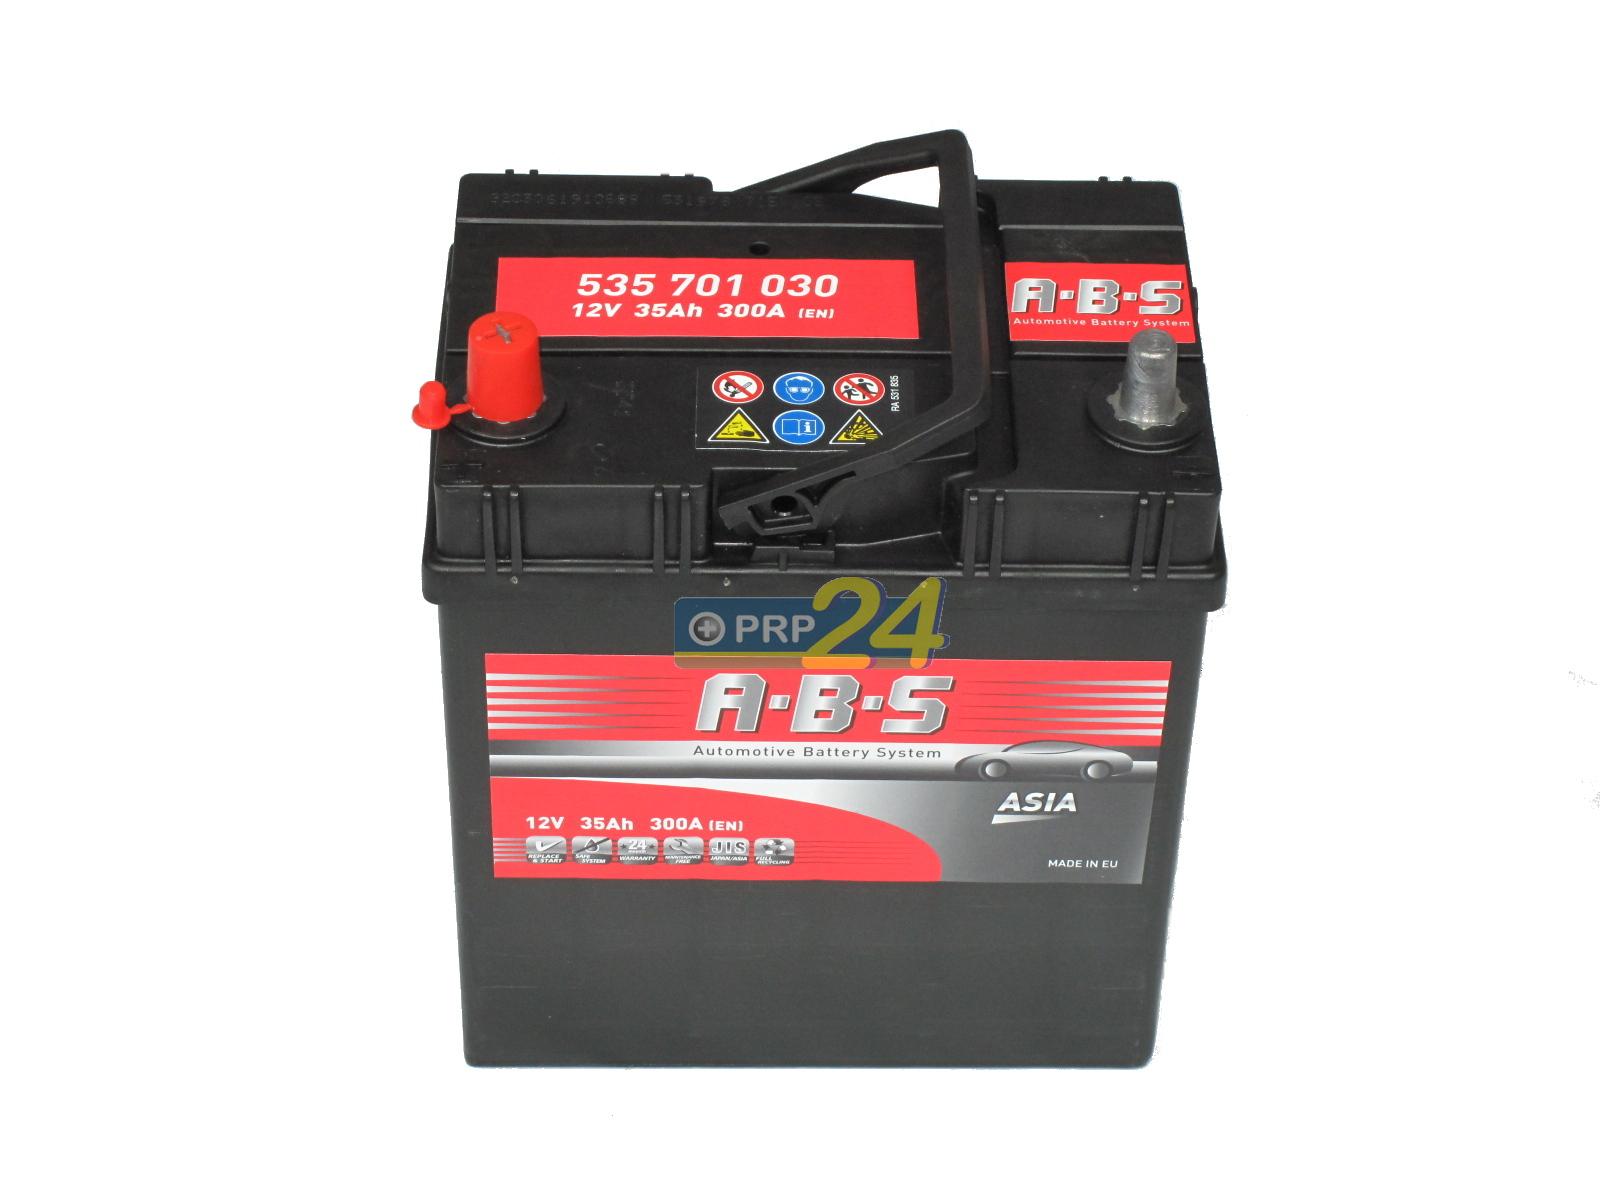 ABS Abs ASIA - 12v 35ah - autó akkumulátor - bal+ *ázsia*vékonysarus